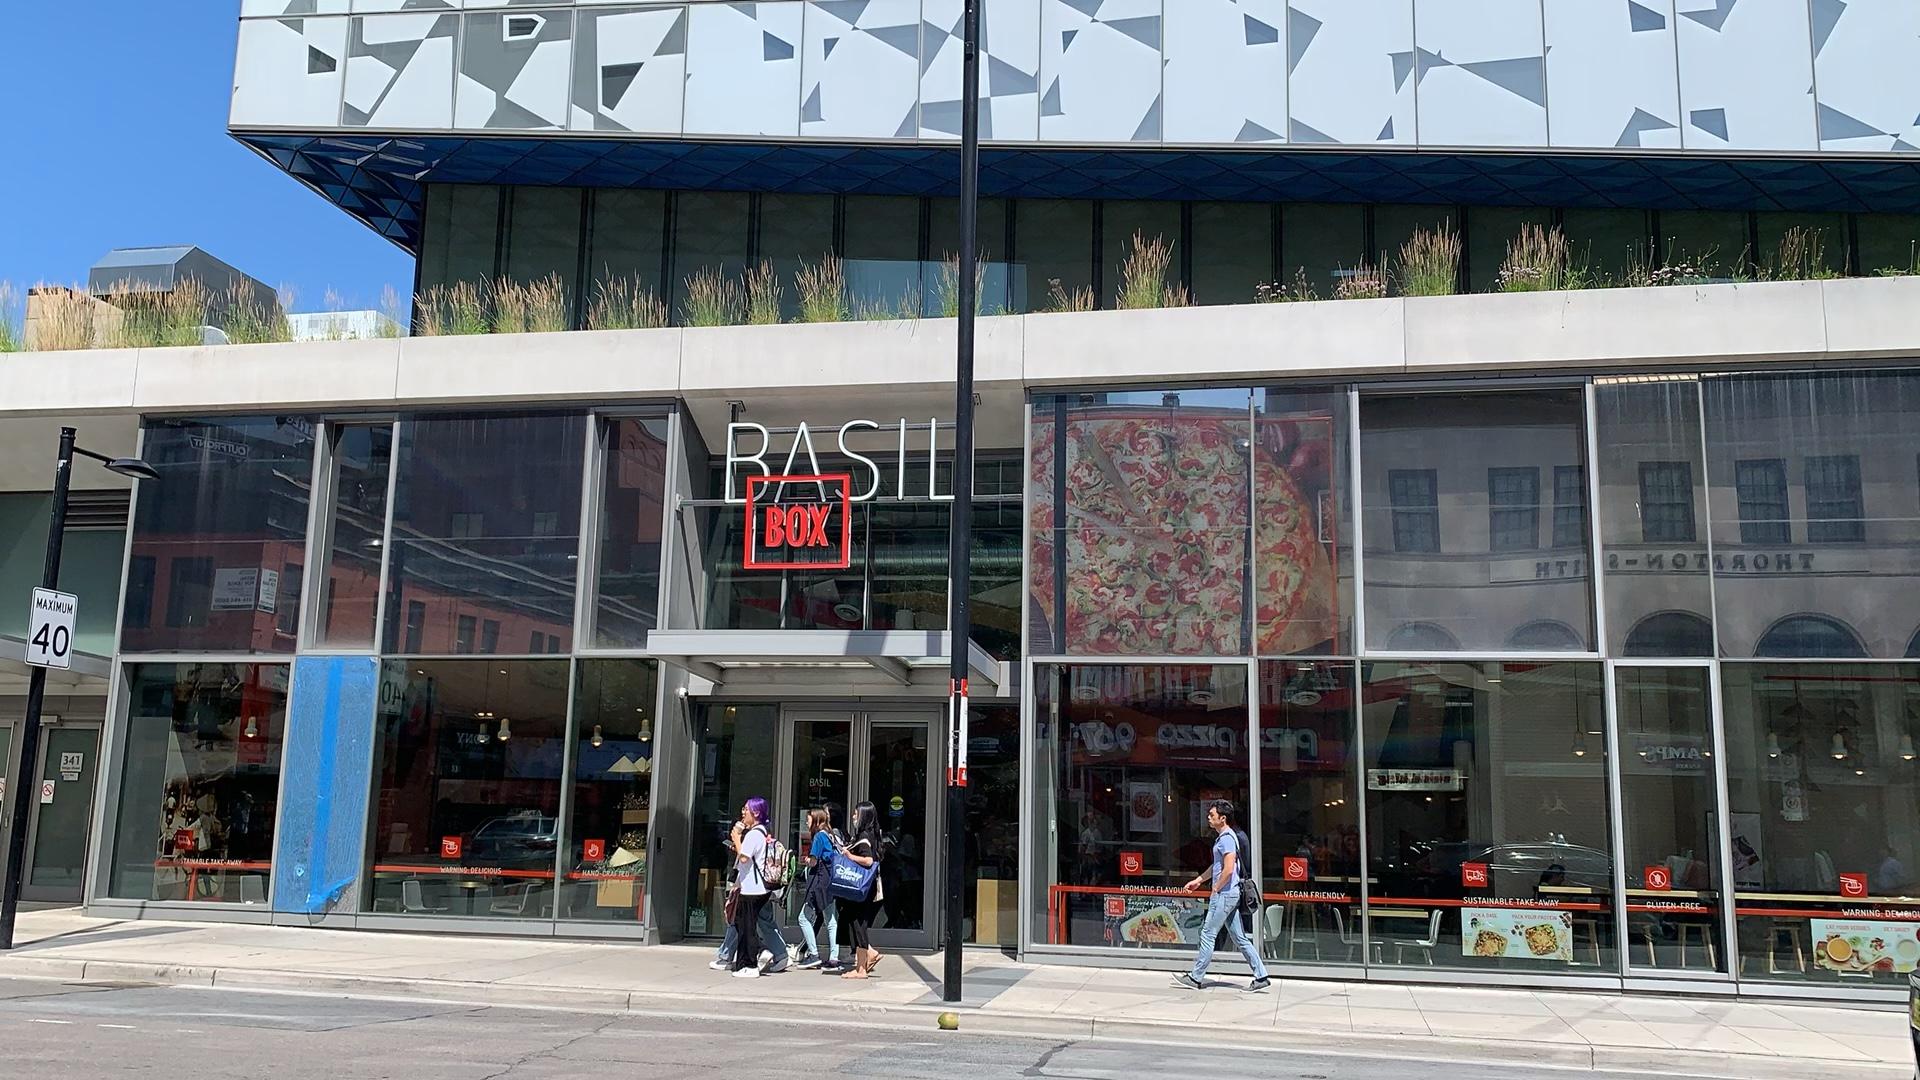 Sign for Basil Box restaurant in Ryerson University Student Learning Centre in Toronto.